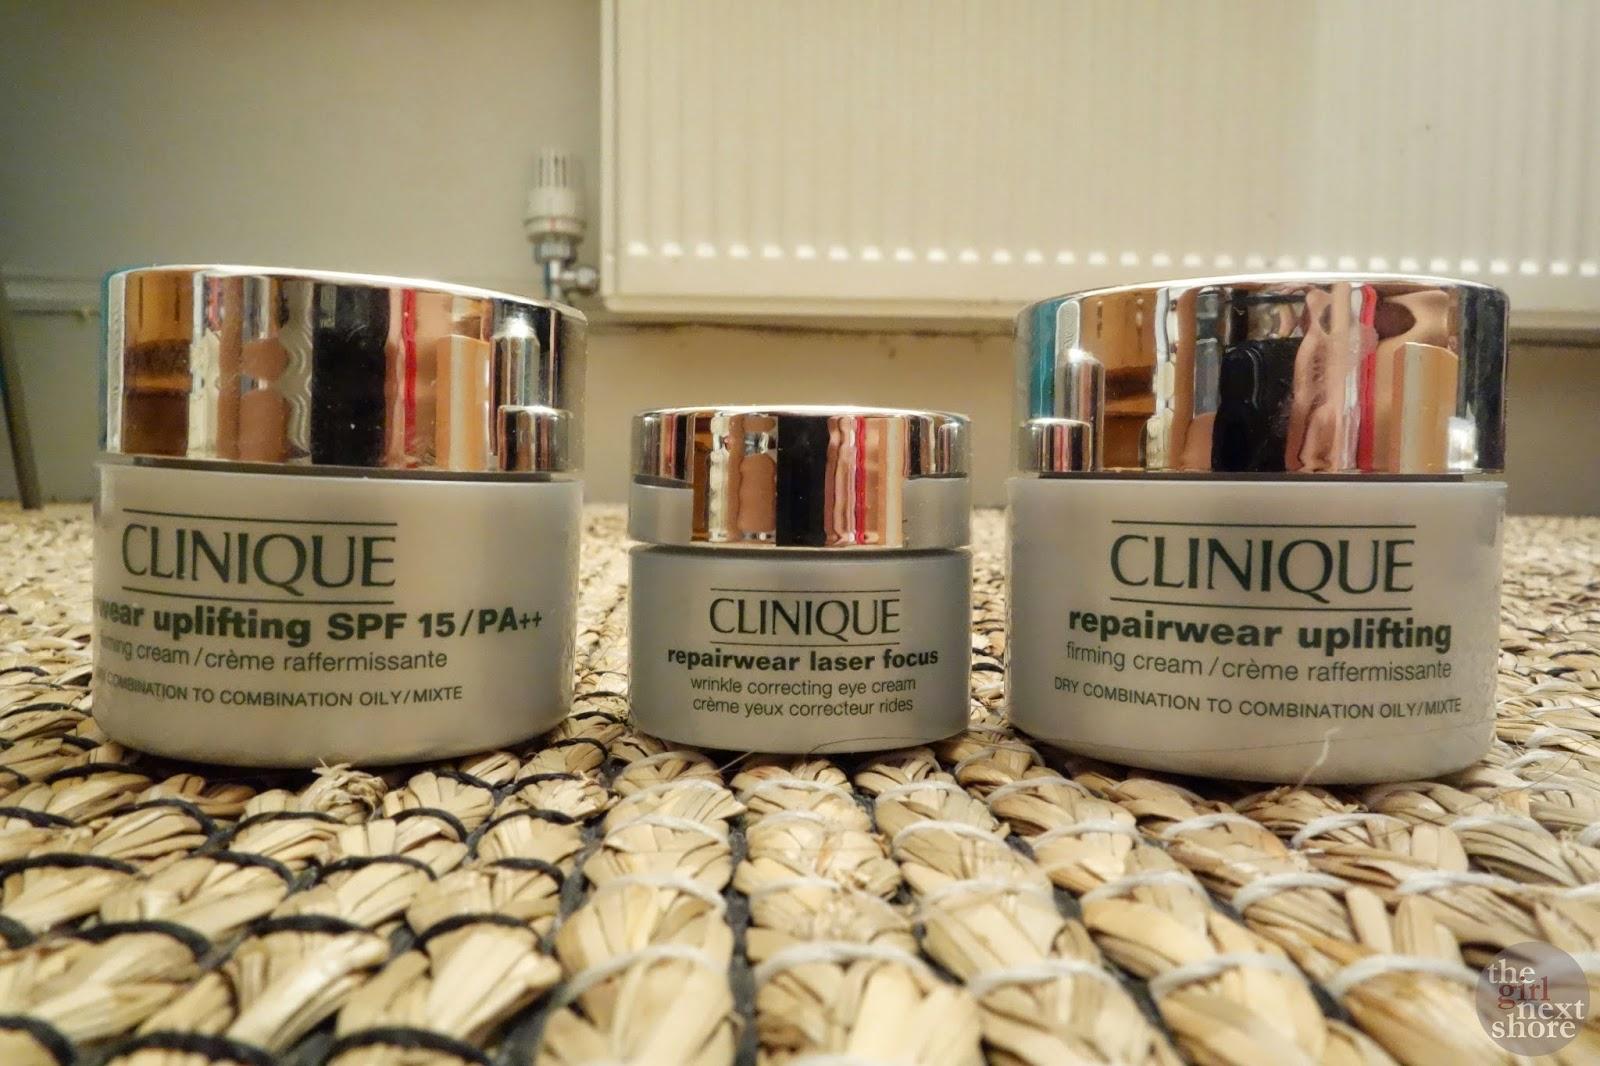 Clinique Repairwear firming cream